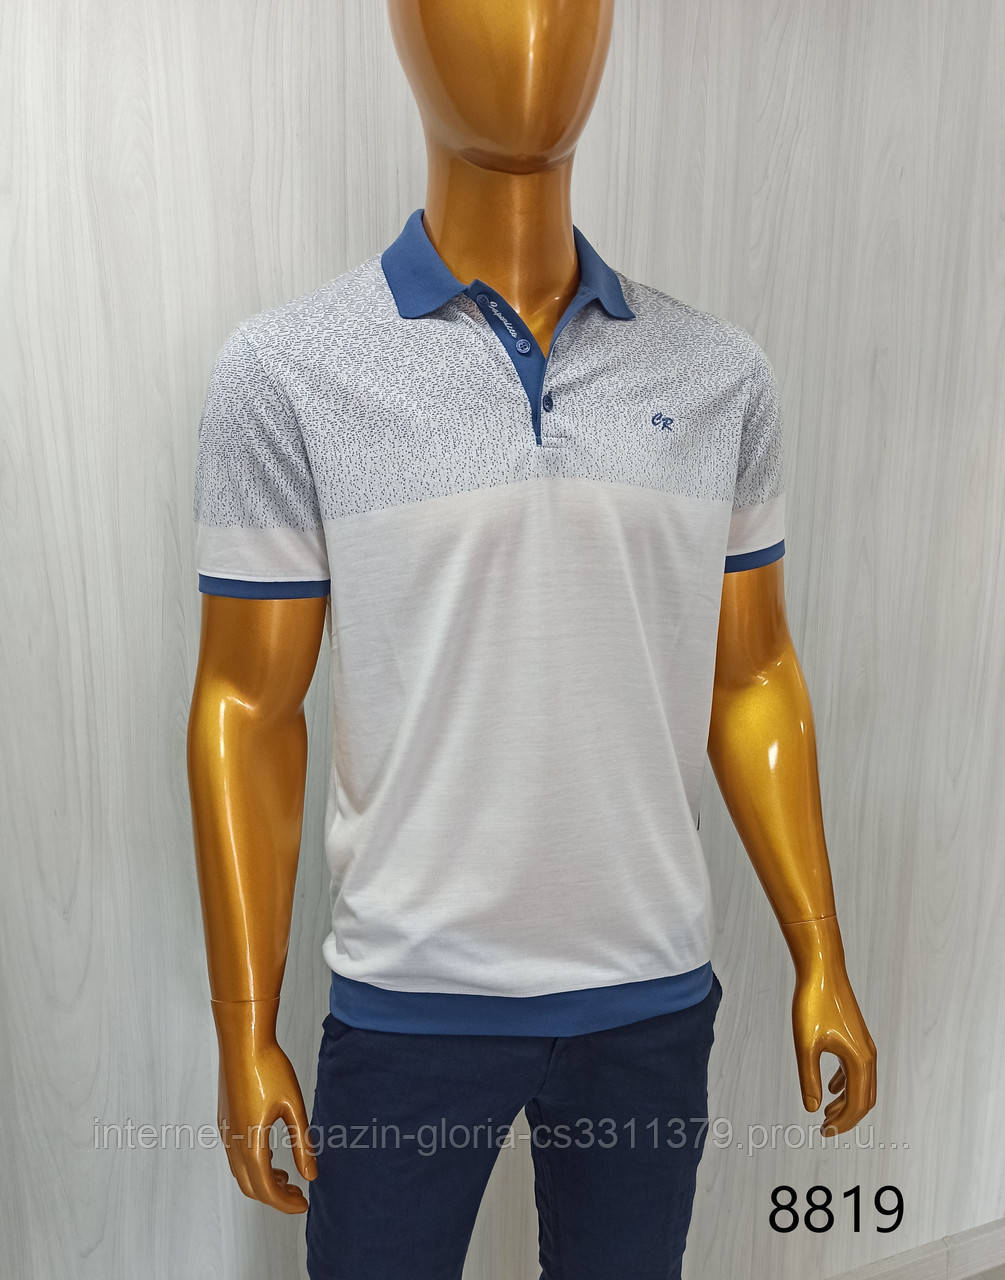 Мужская футболка поло Caporicco. PSL-8819. Размеры: M,L,XL,XXL.